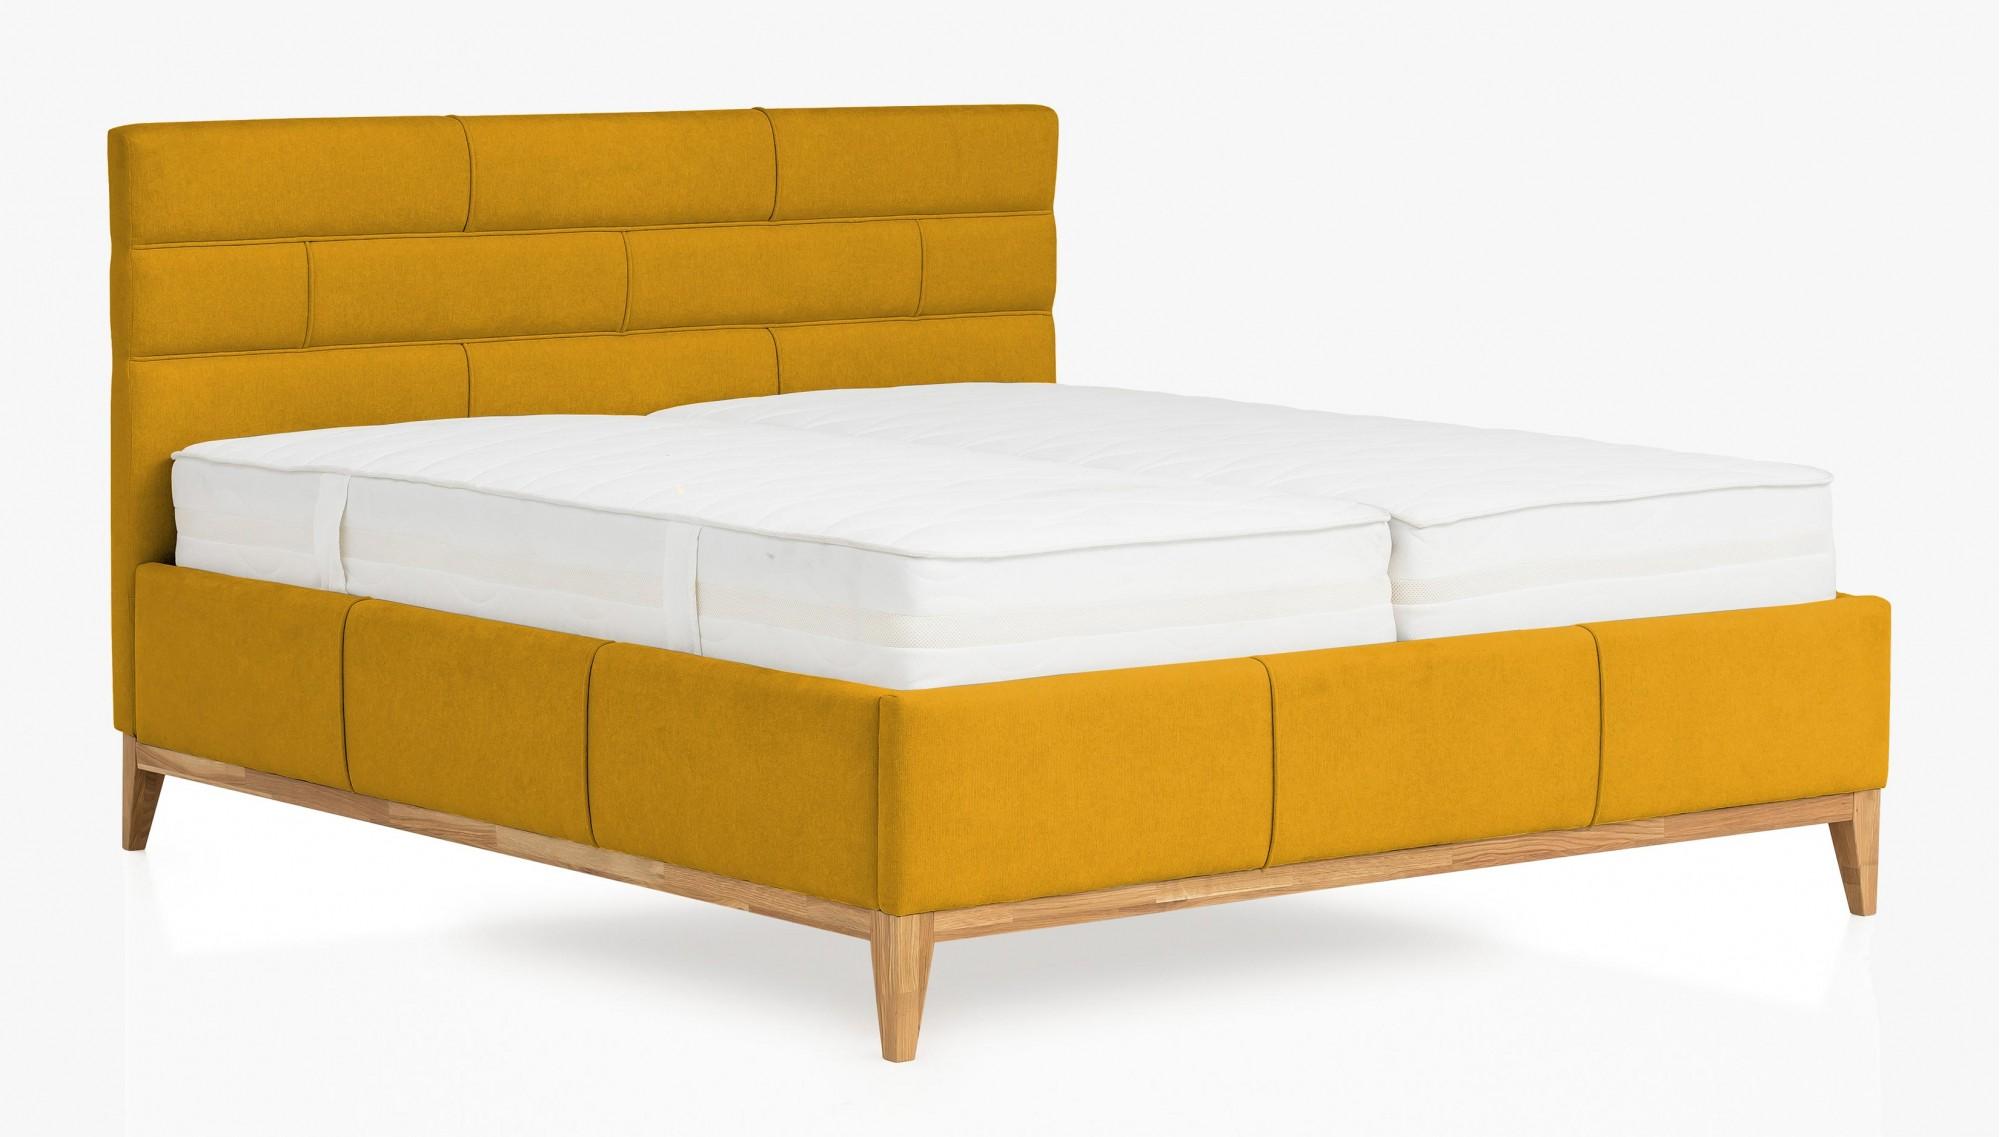 Manželská posteľ boxspring . žltá látka